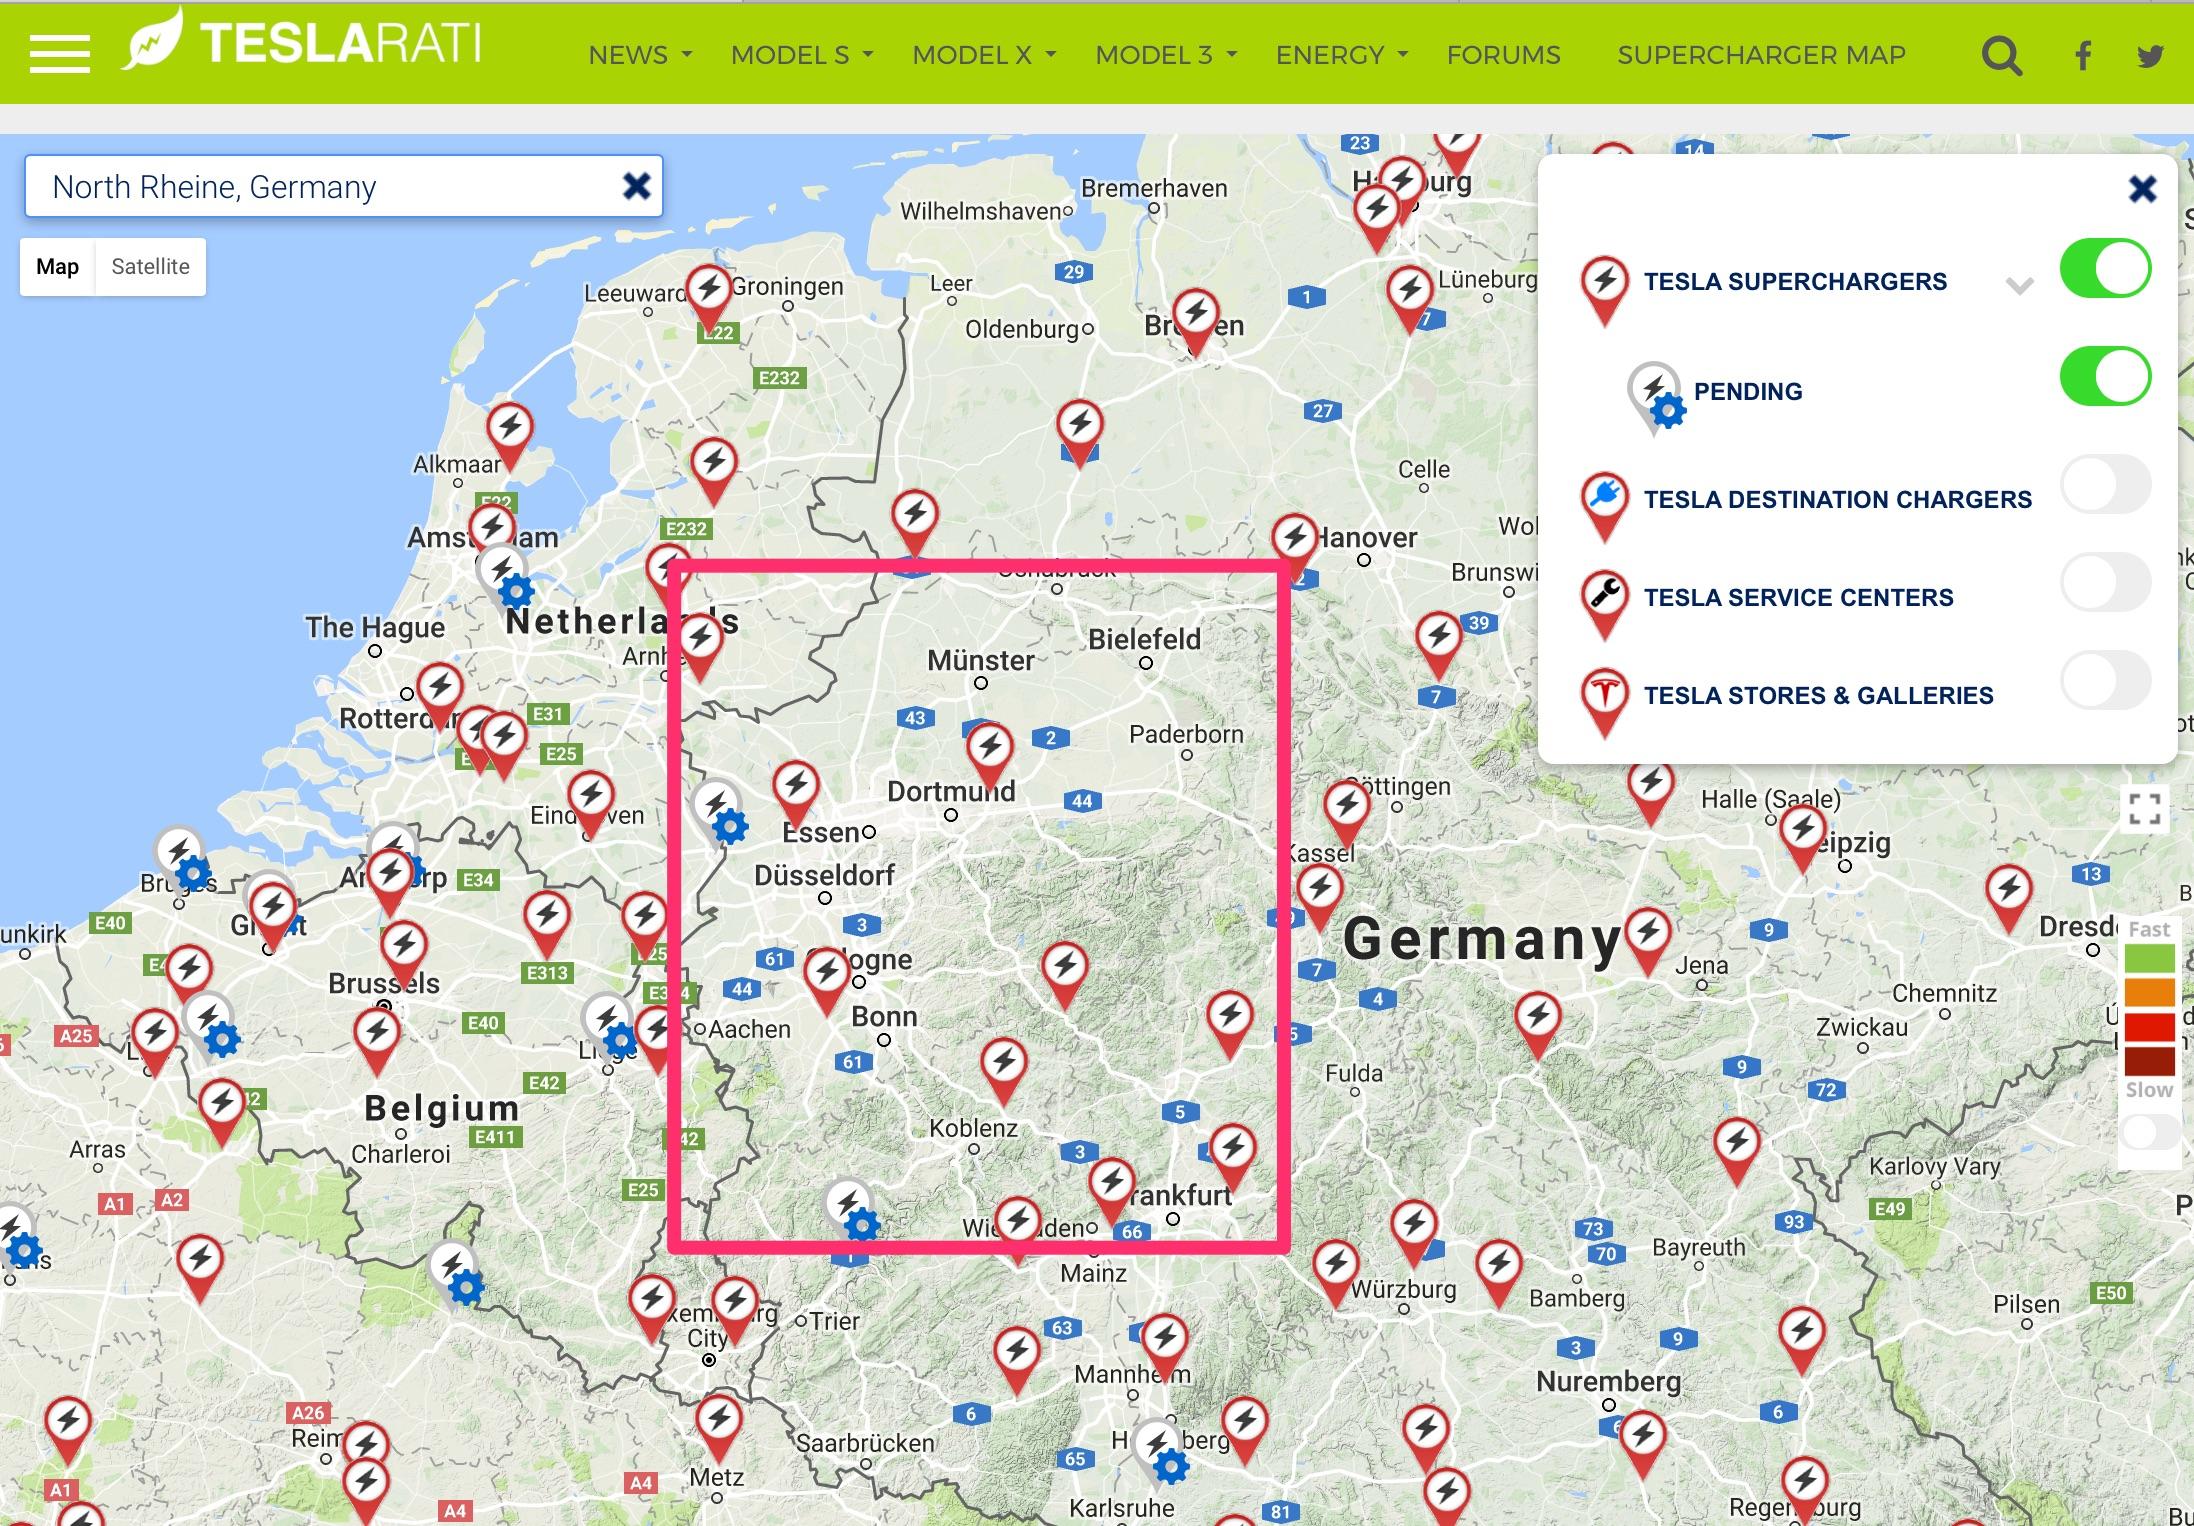 tesla-supercharger-map-rheine-germany - TESLARATI